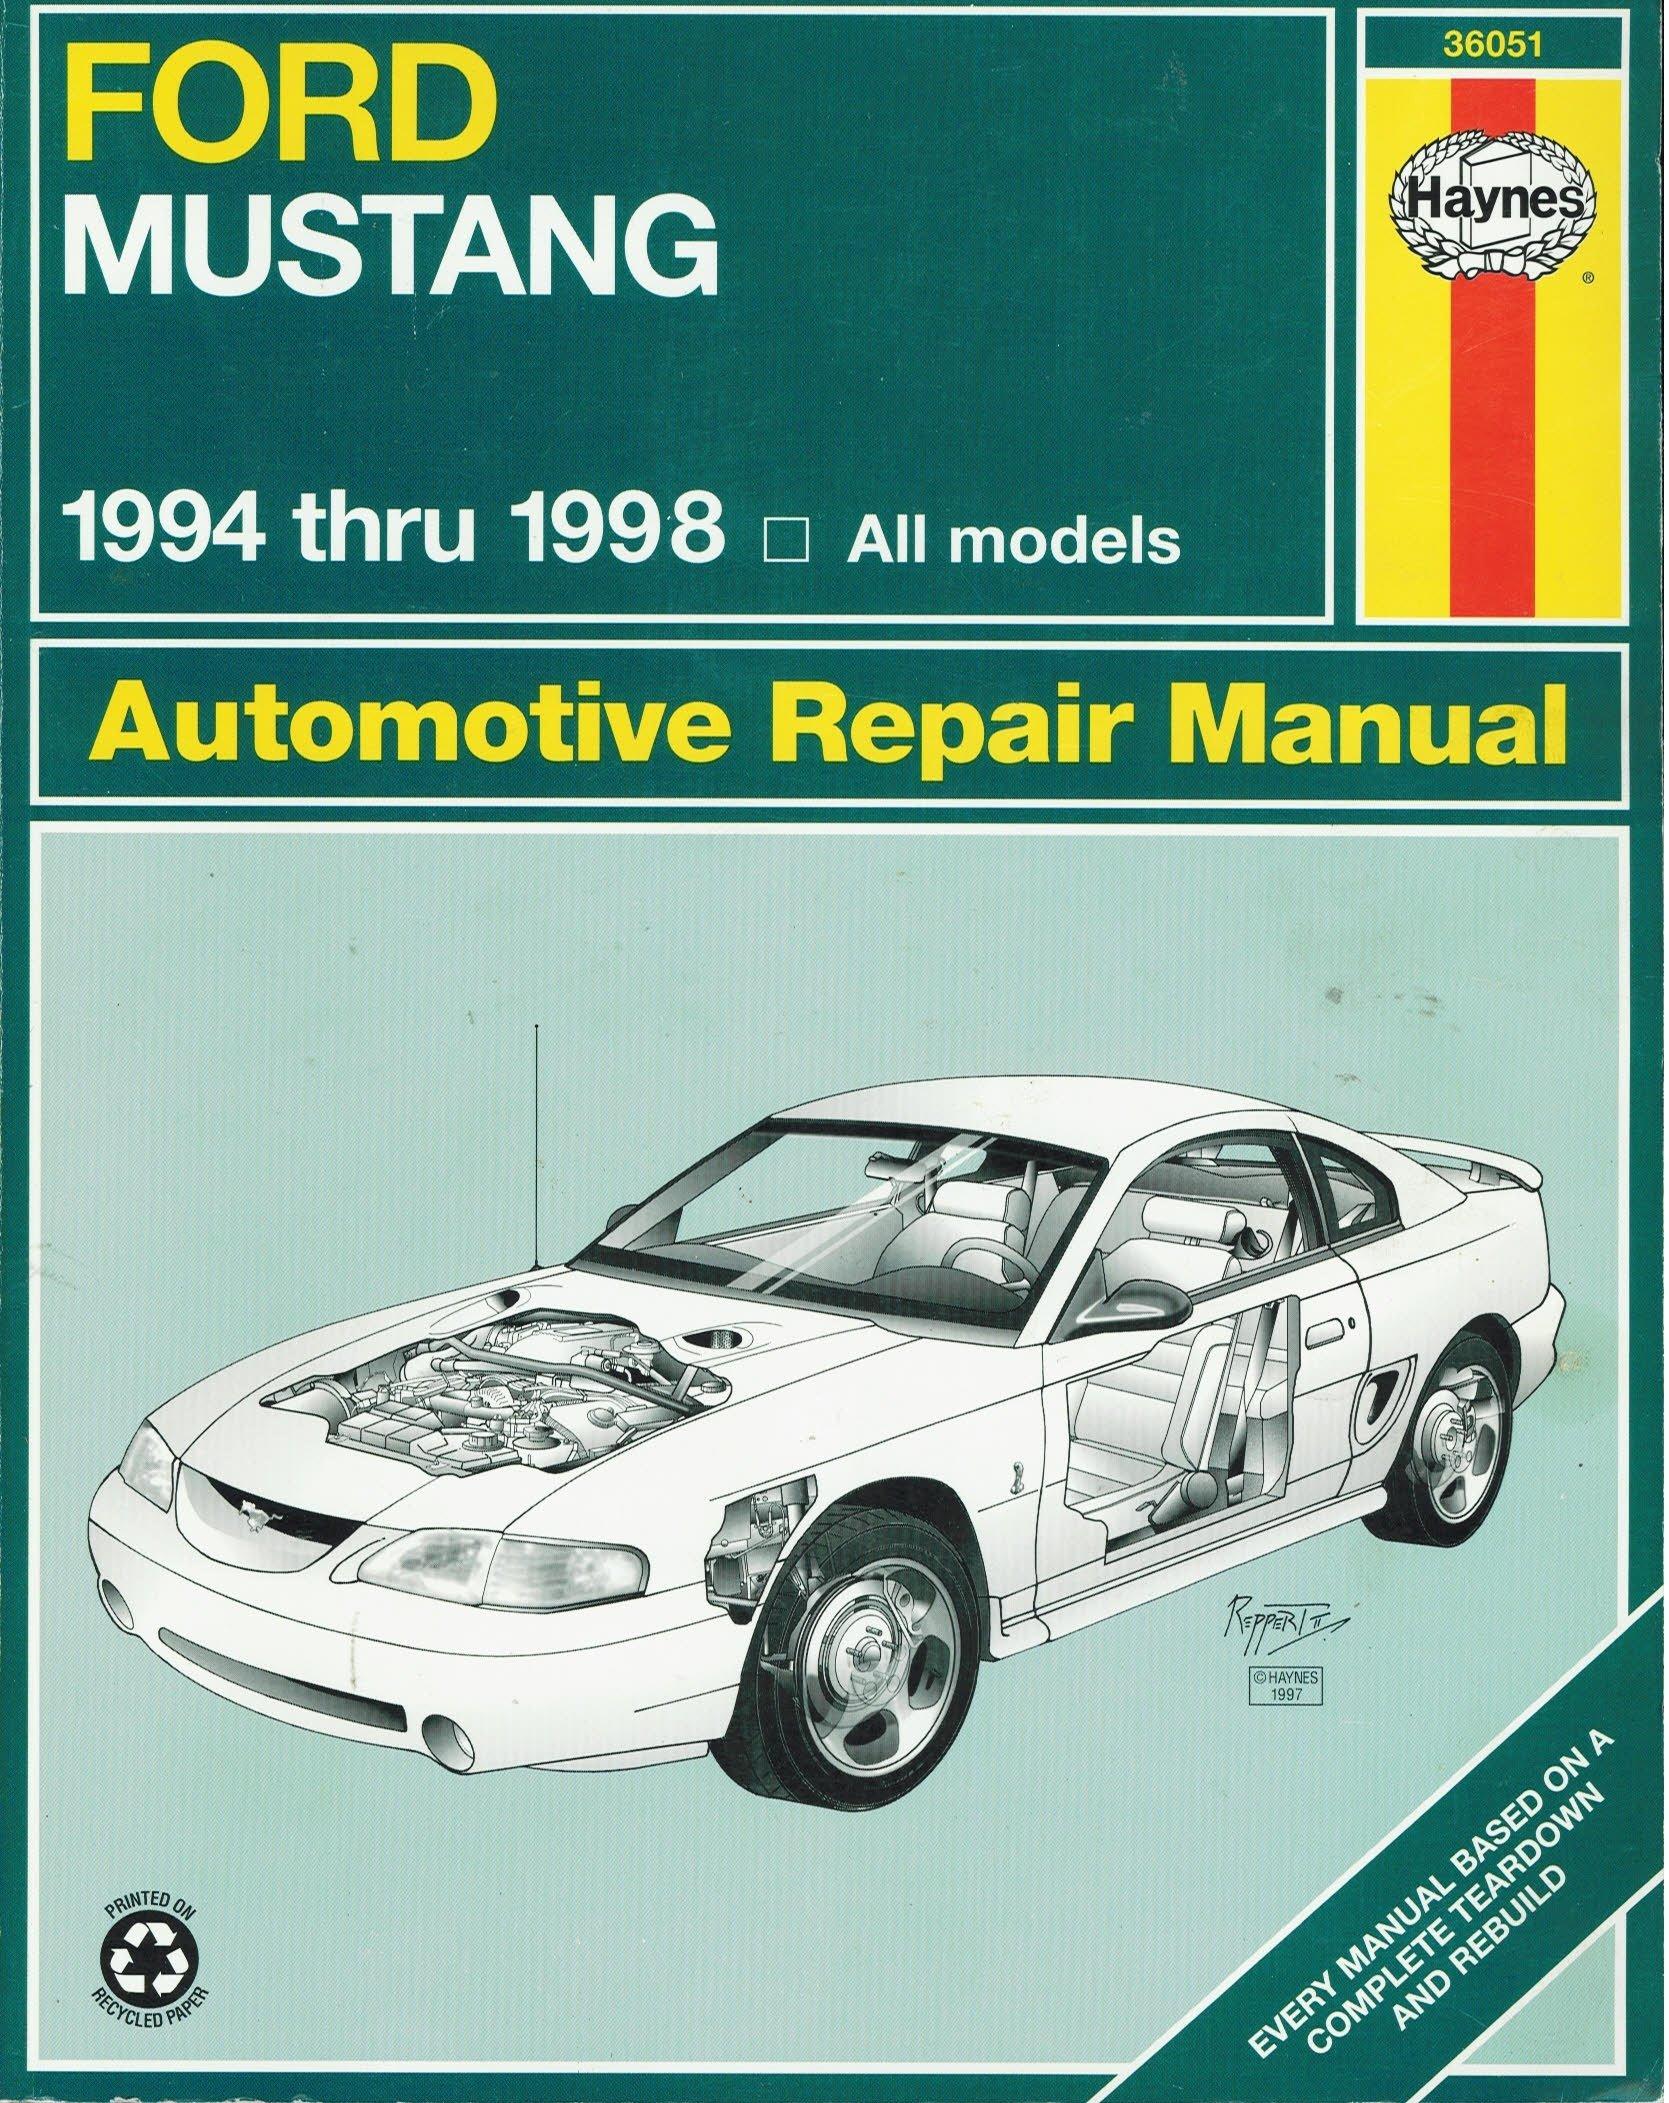 haynes ford mustang 1994 thru 1998 haynes automotive repair rh amazon com 2011 Ford Mustang Manual 2011 Ford Mustang Manual